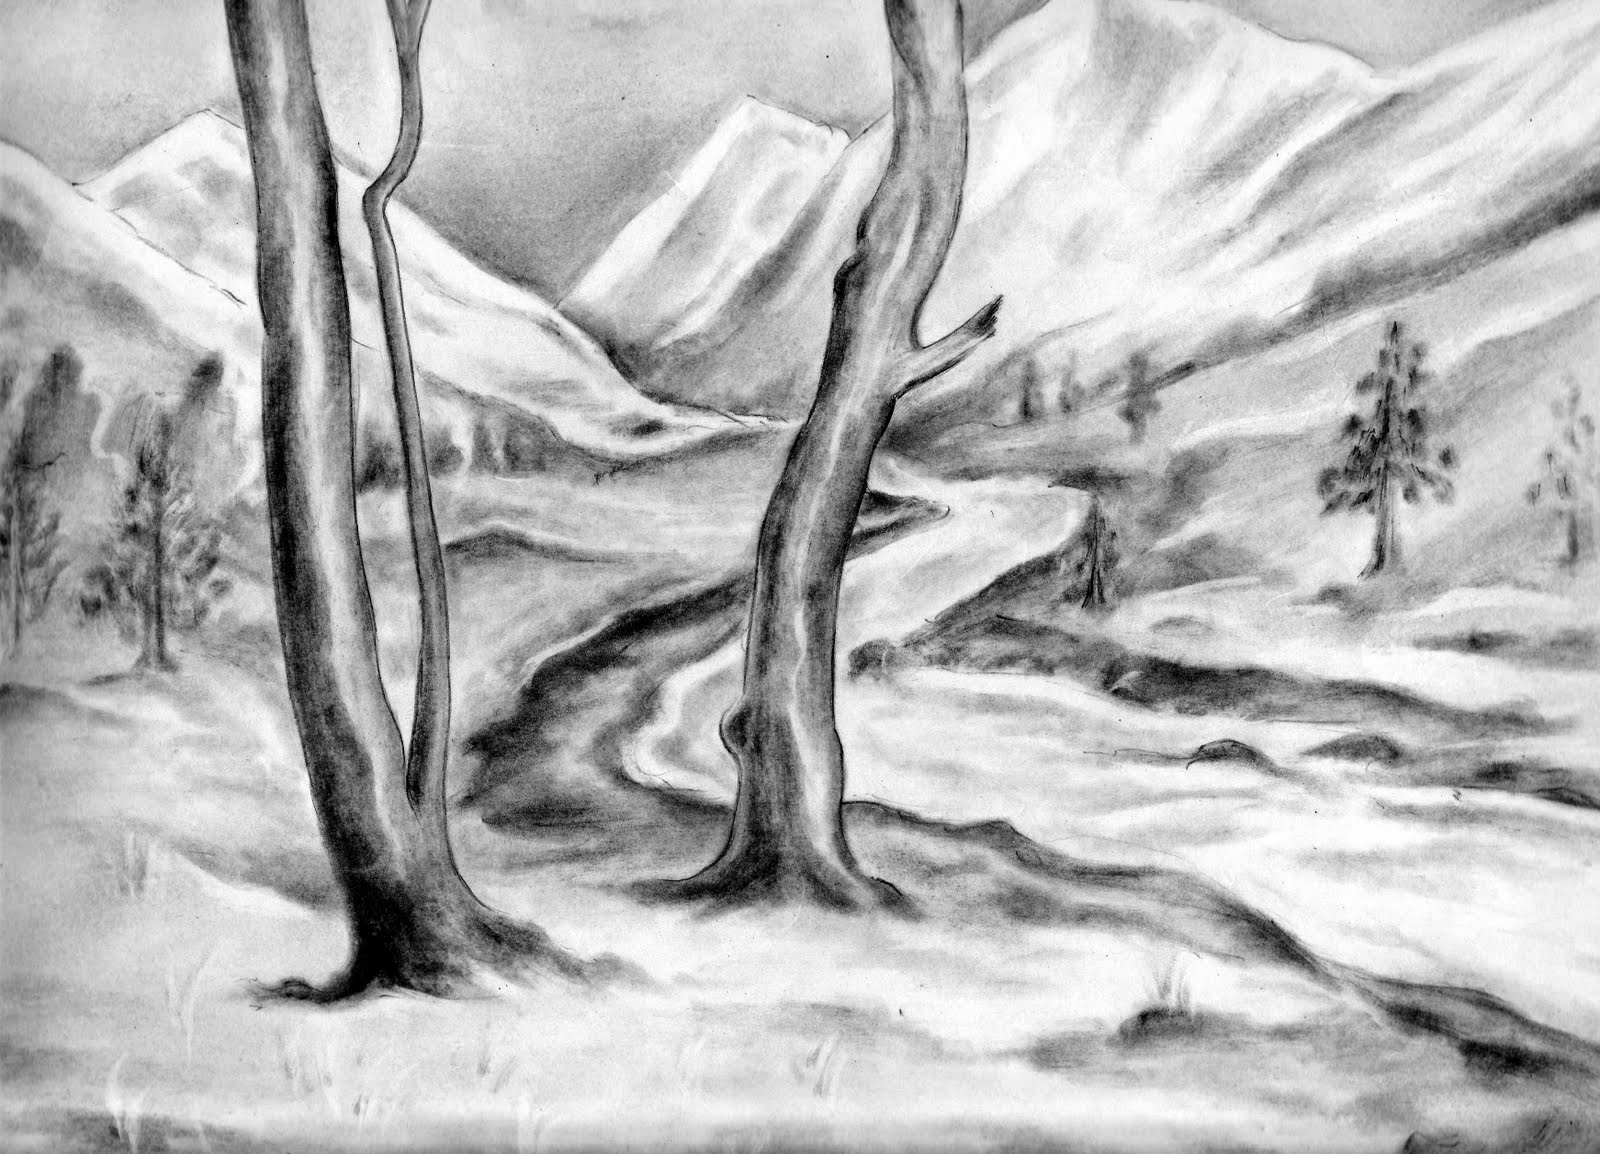 My pencil drawings natural